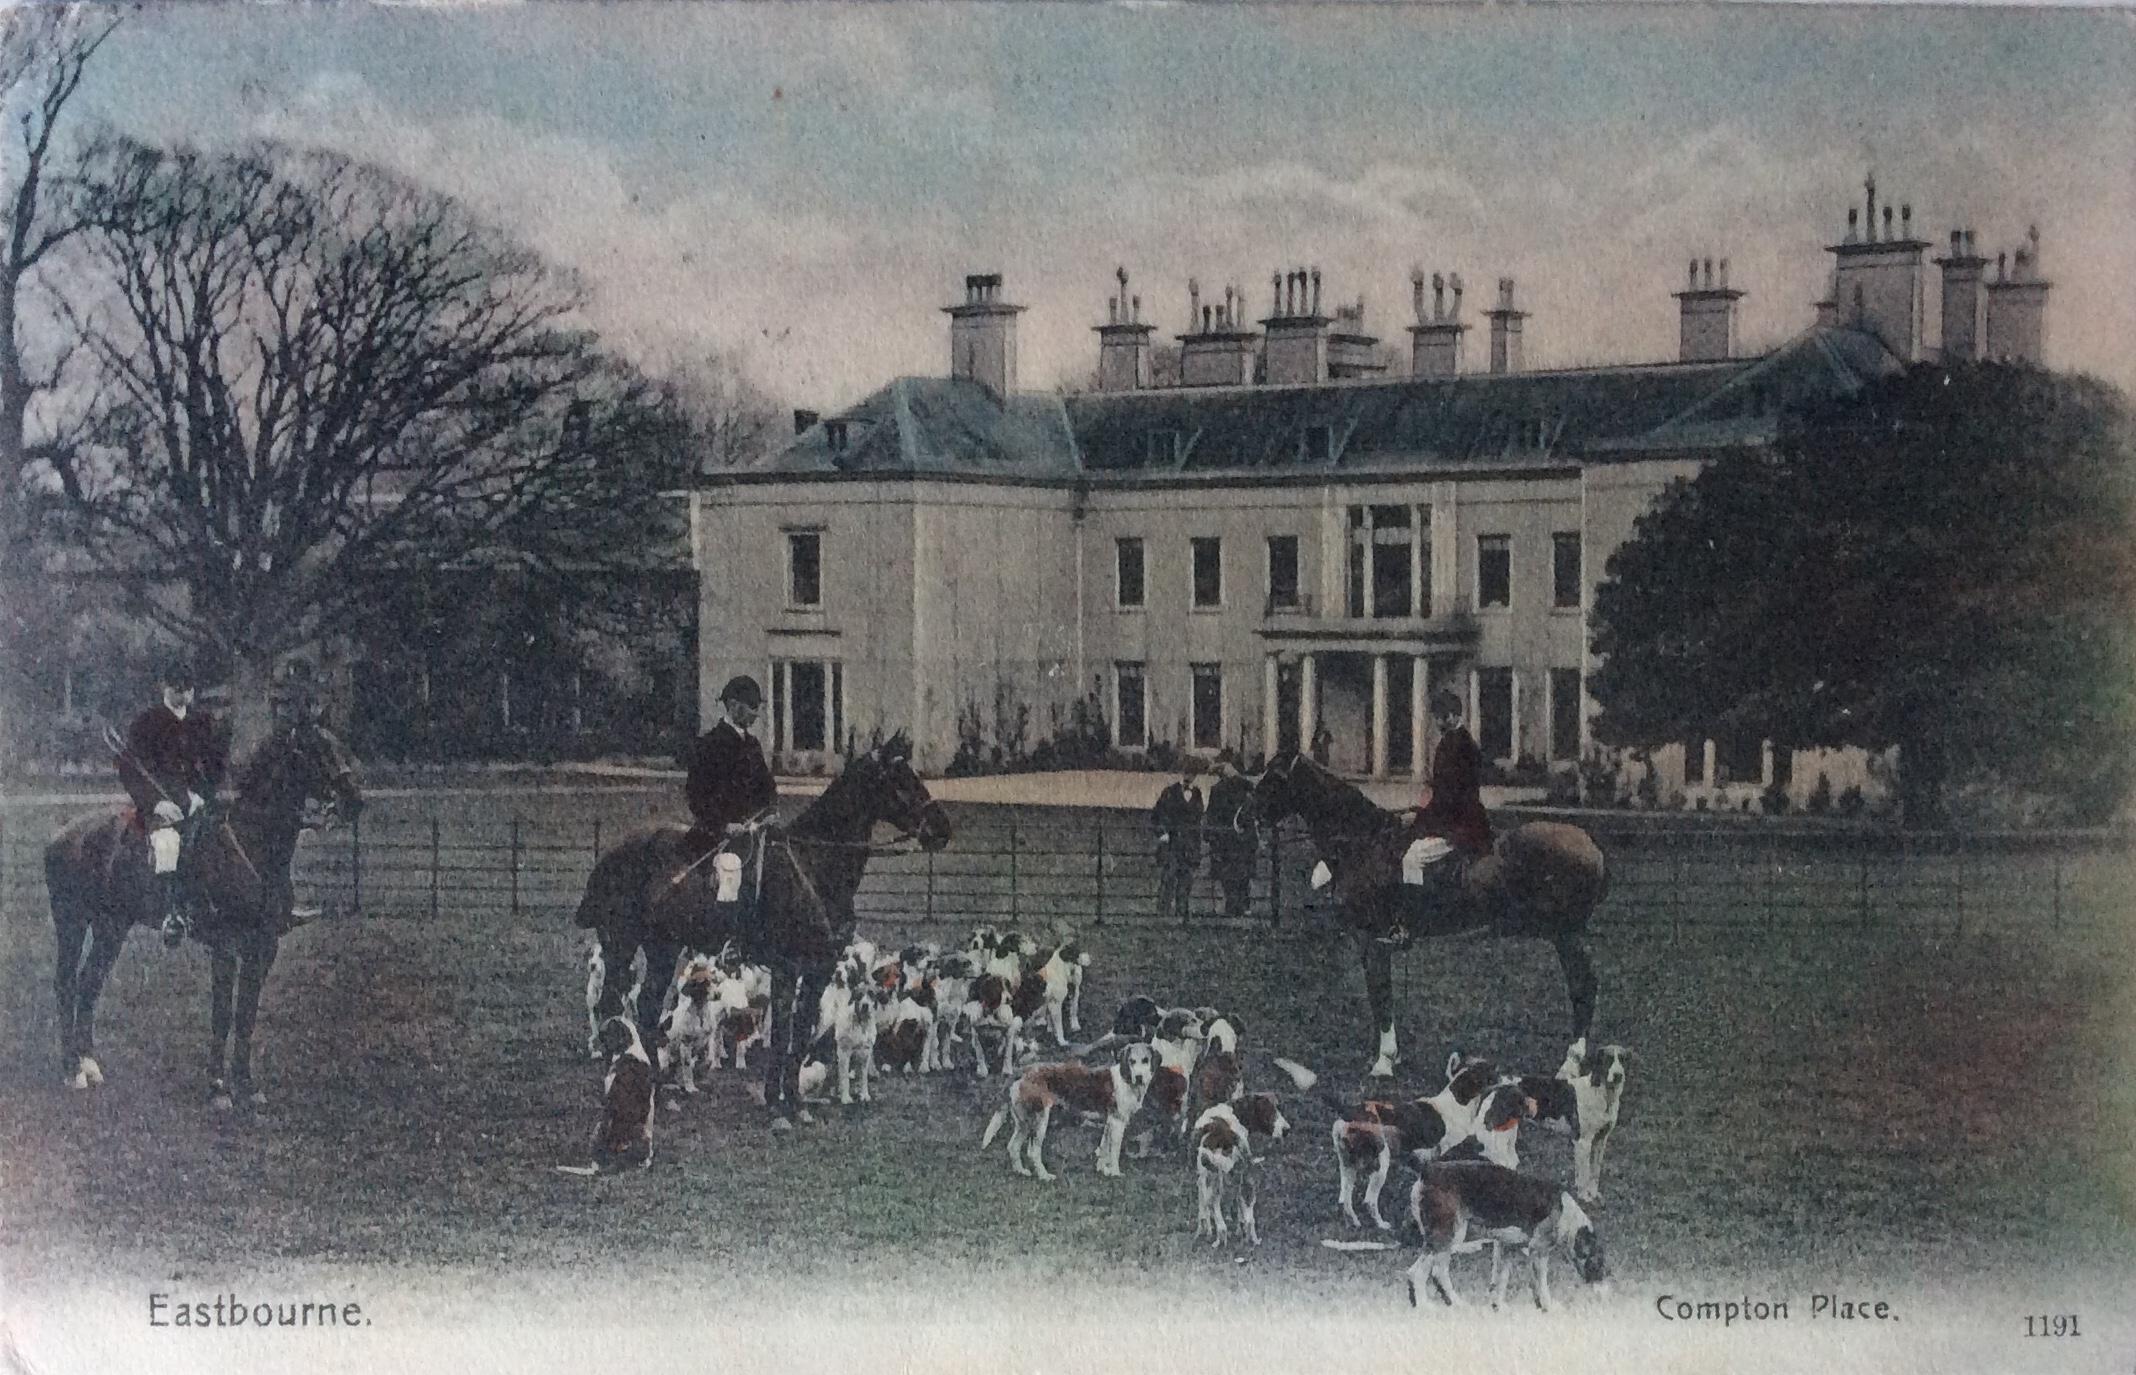 1905 June 1 The Duke of Devonshire's Place